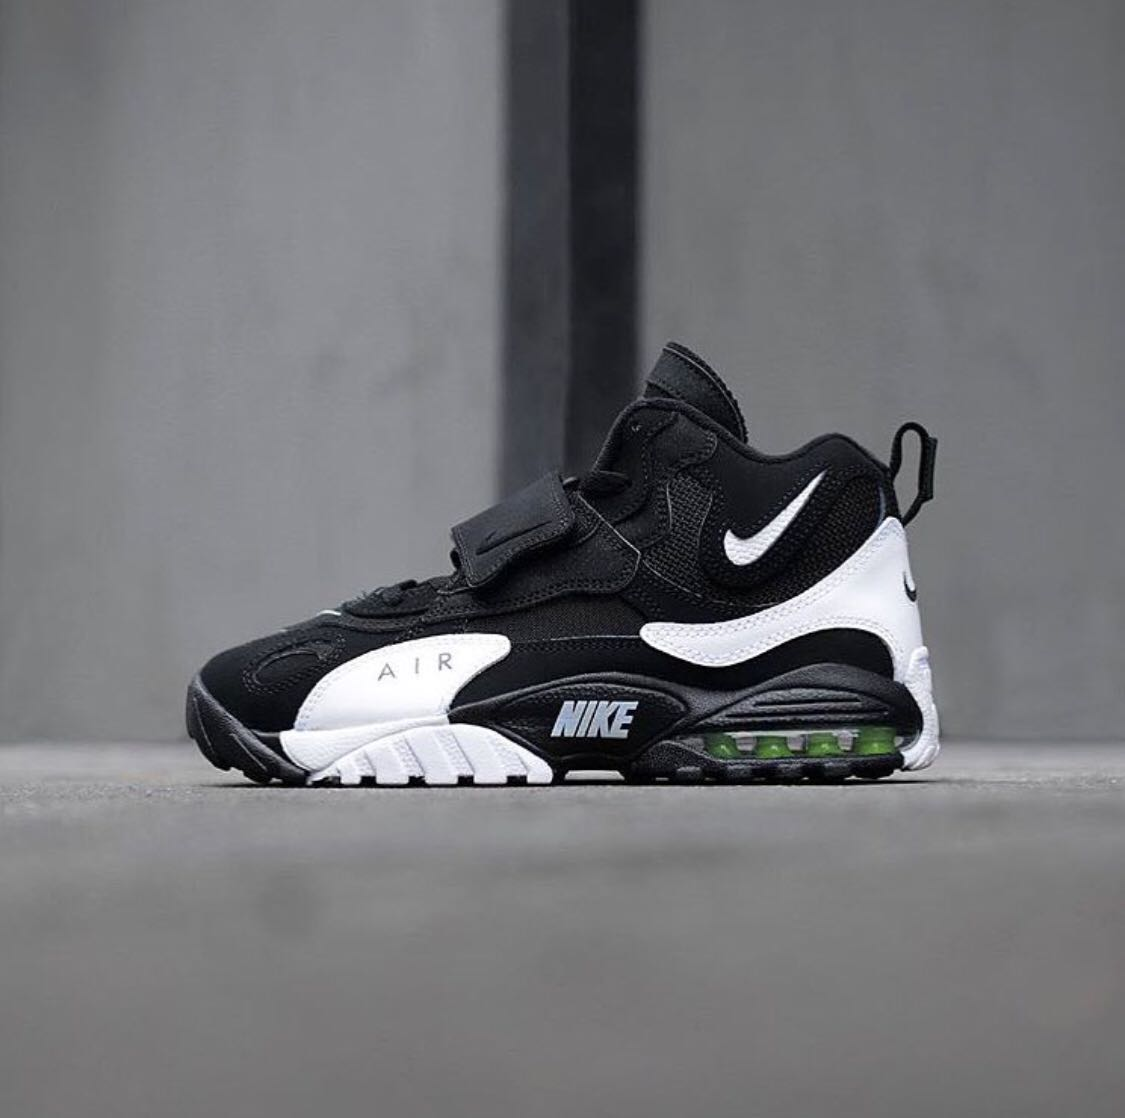 b0be76249 Men's Nike Air Max Speed Turf, Men's Fashion, Footwear, Sneakers on ...